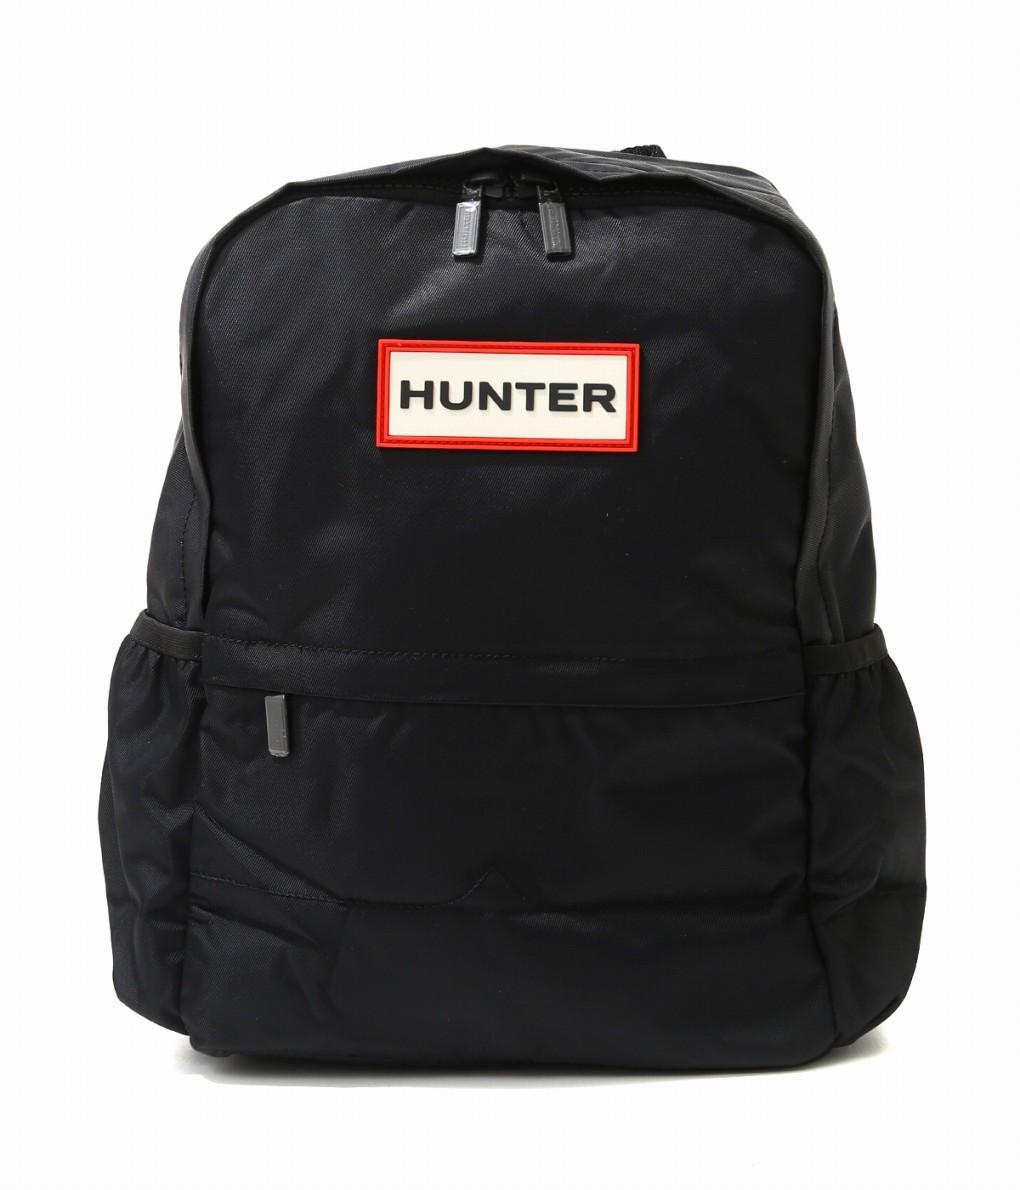 HUNTER / ハンター : 【レディース】ORIGINAL NYLON BACKPACK : ハンター オリジナル ナイロン バッグ バックパック レディース : UBB5028KBM 【DEA】